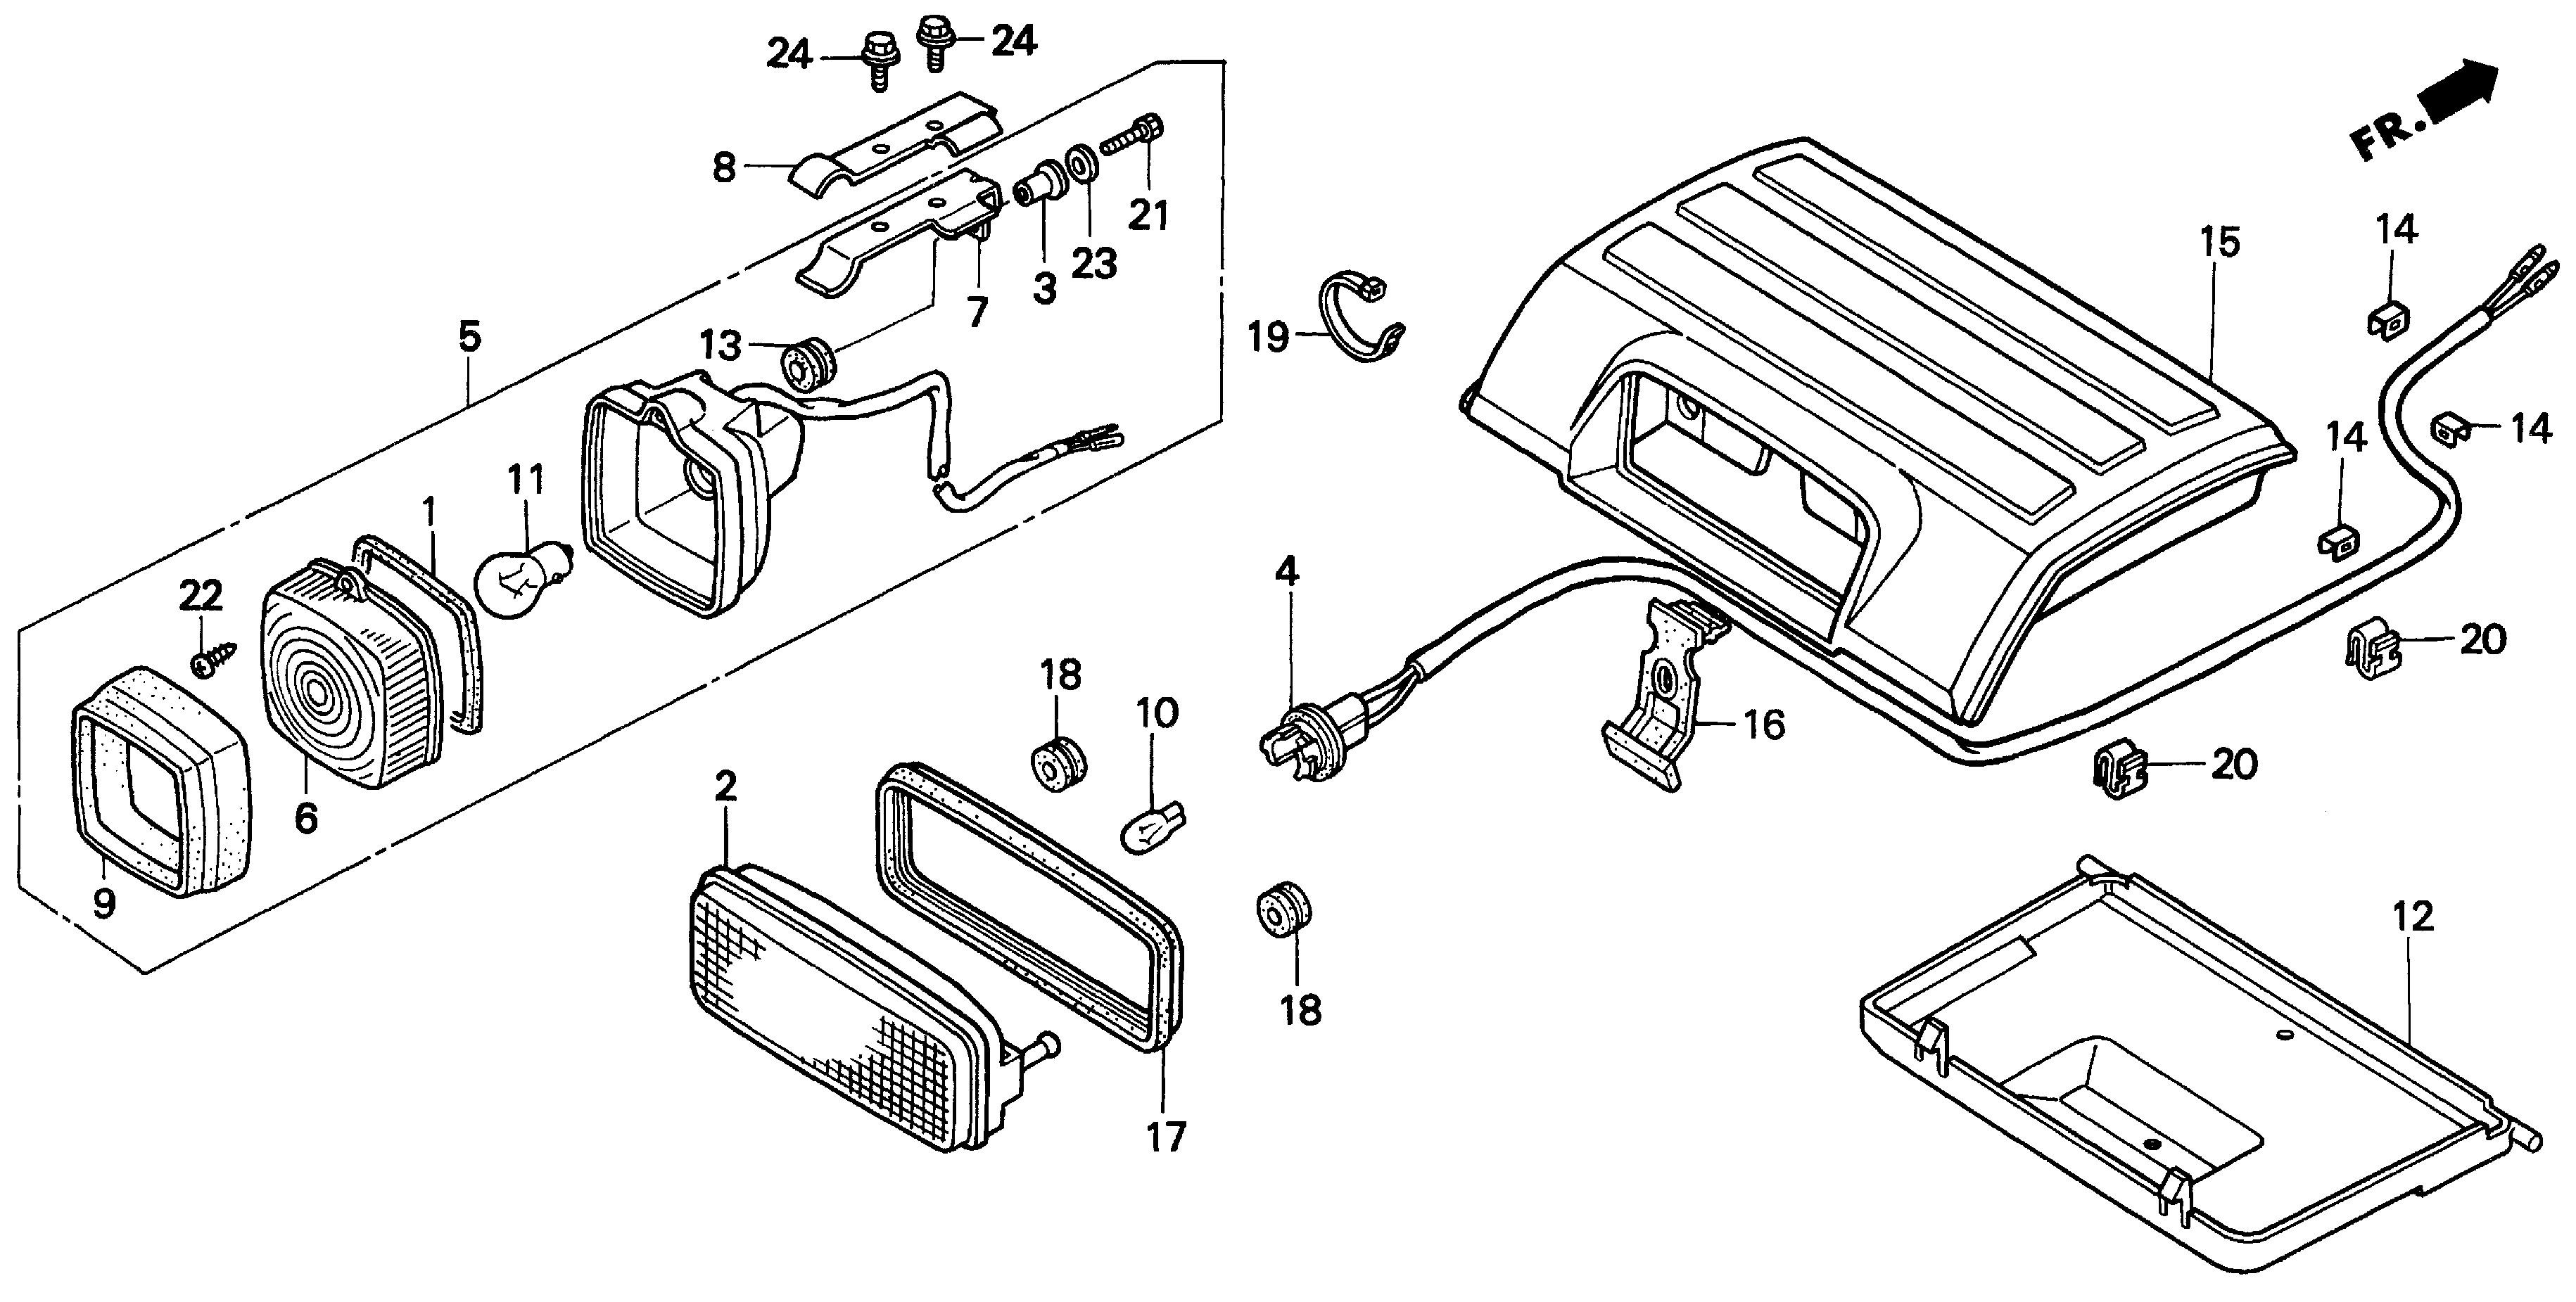 Diagram Of Honda Atv Parts 2000 Trx300 A Taillight Diagram